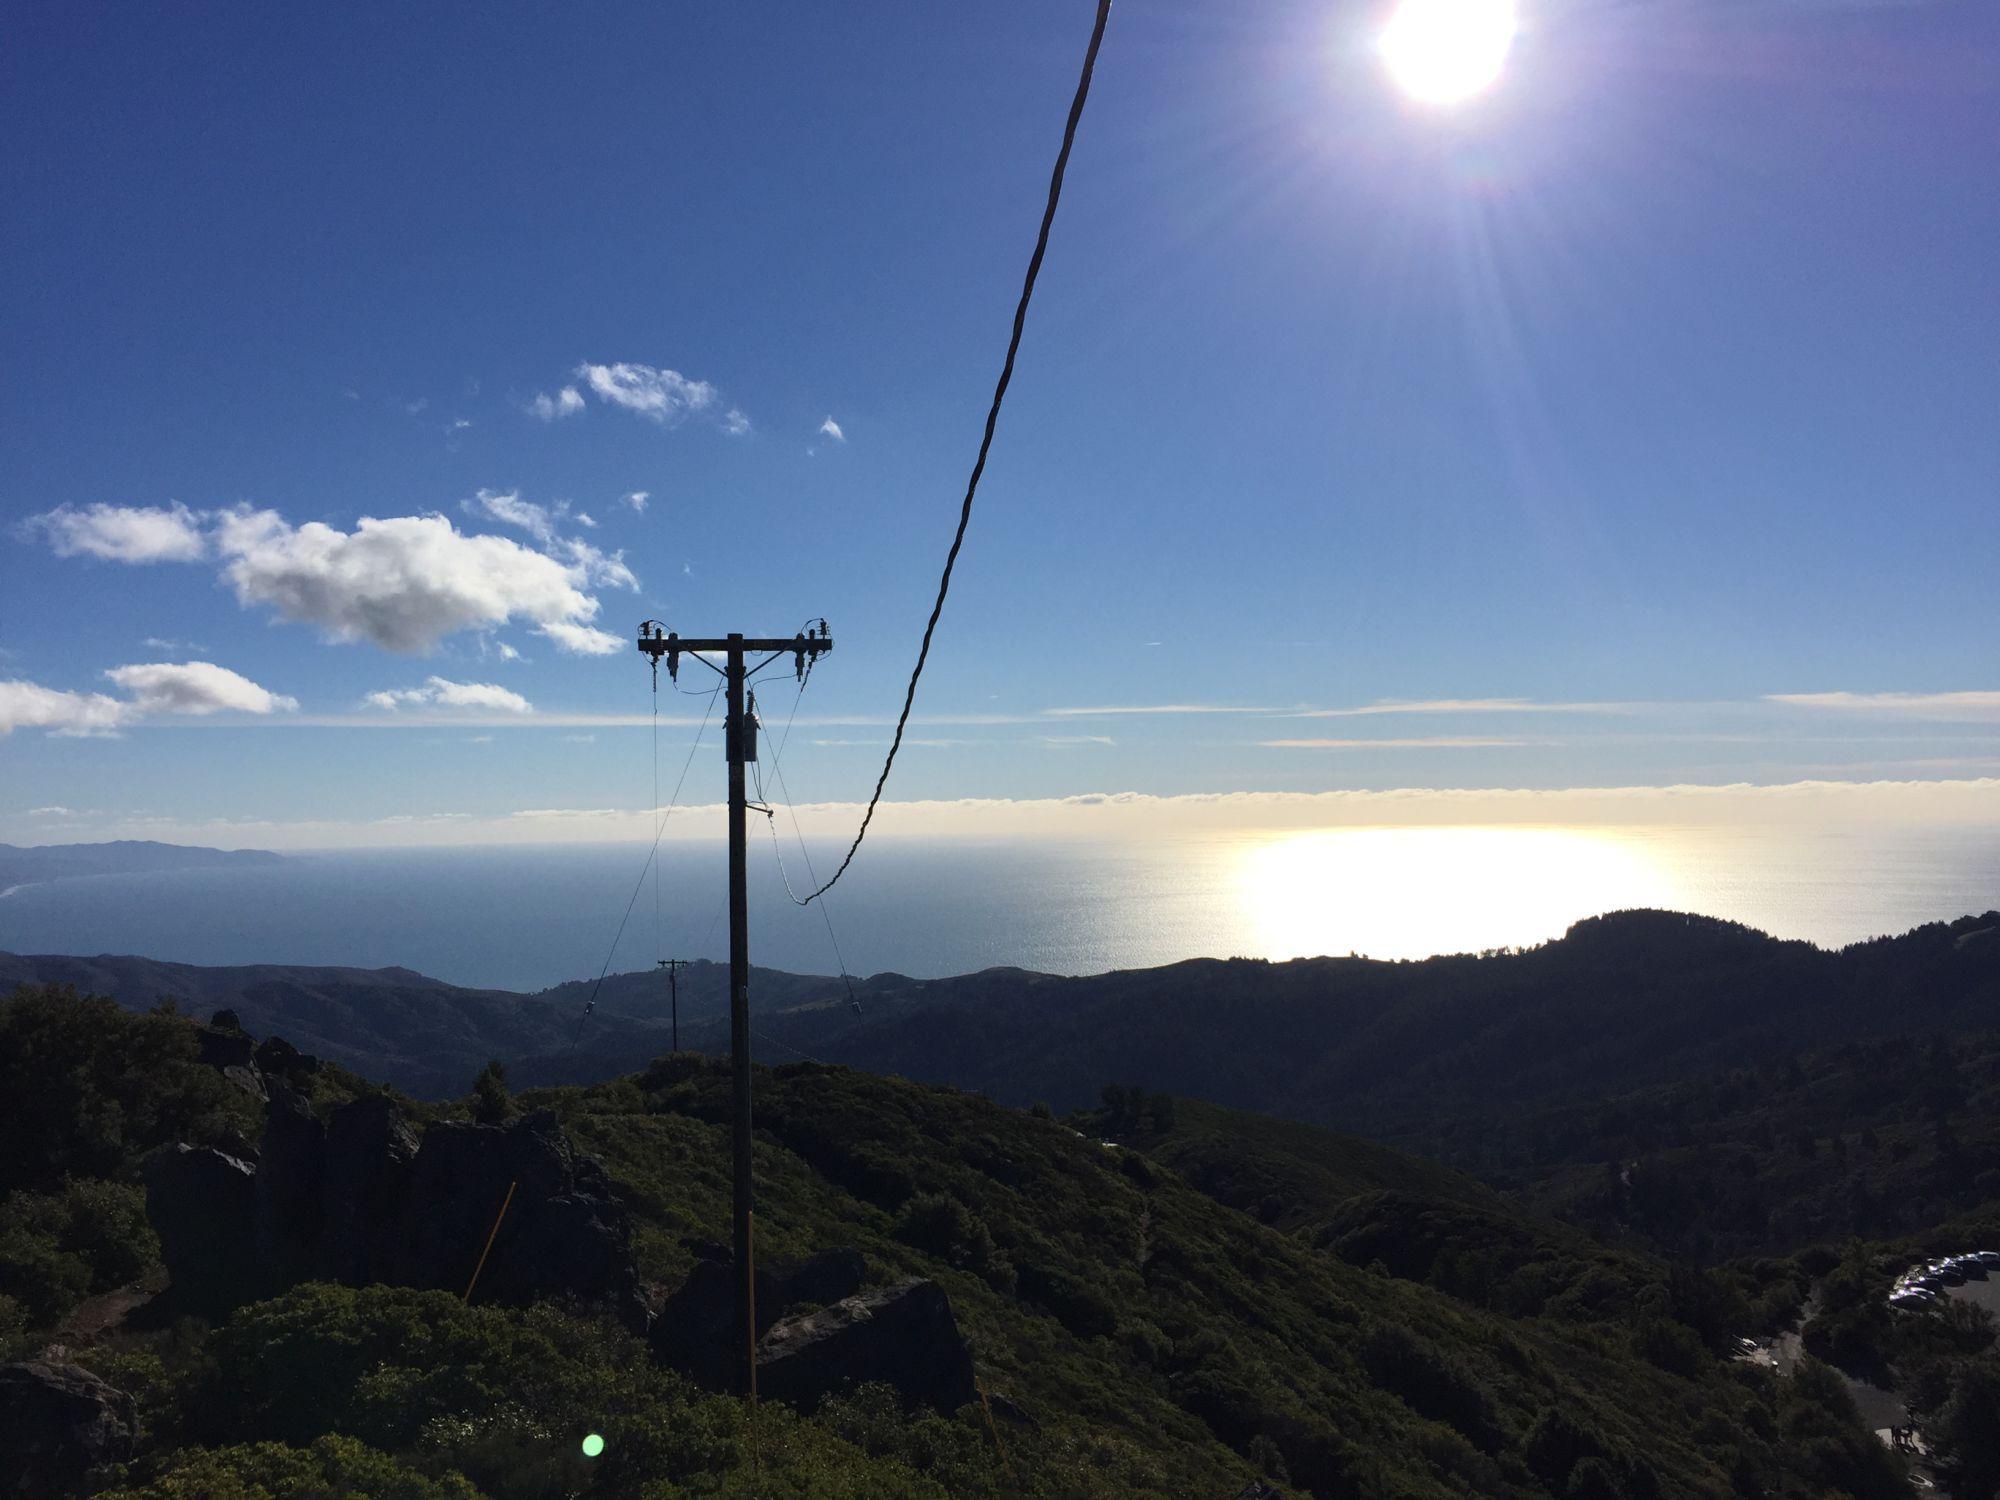 Exploring Marin County's environmental impact: are we actually green?